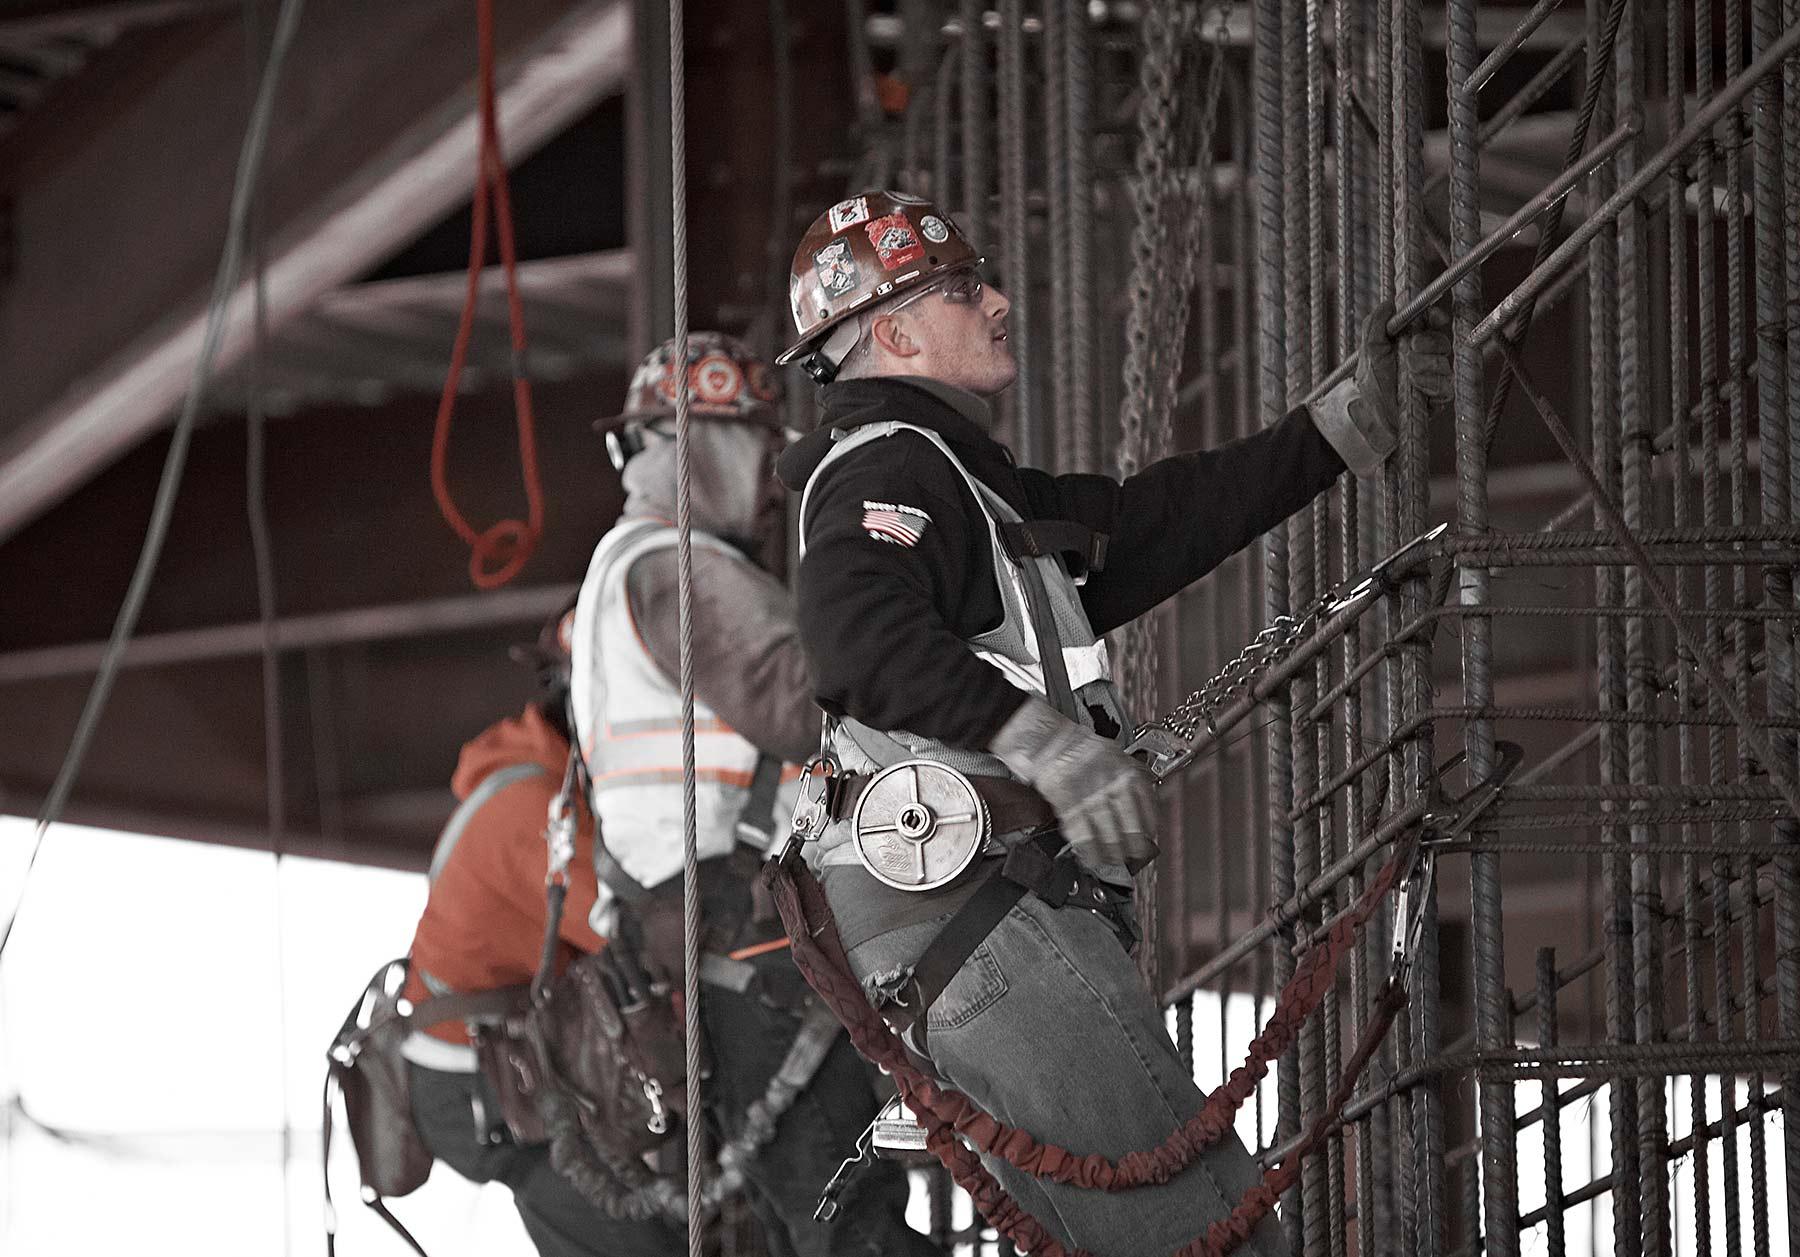 Jeremy-Frechette-OWTC-Construction-iron-workers-02.jpg